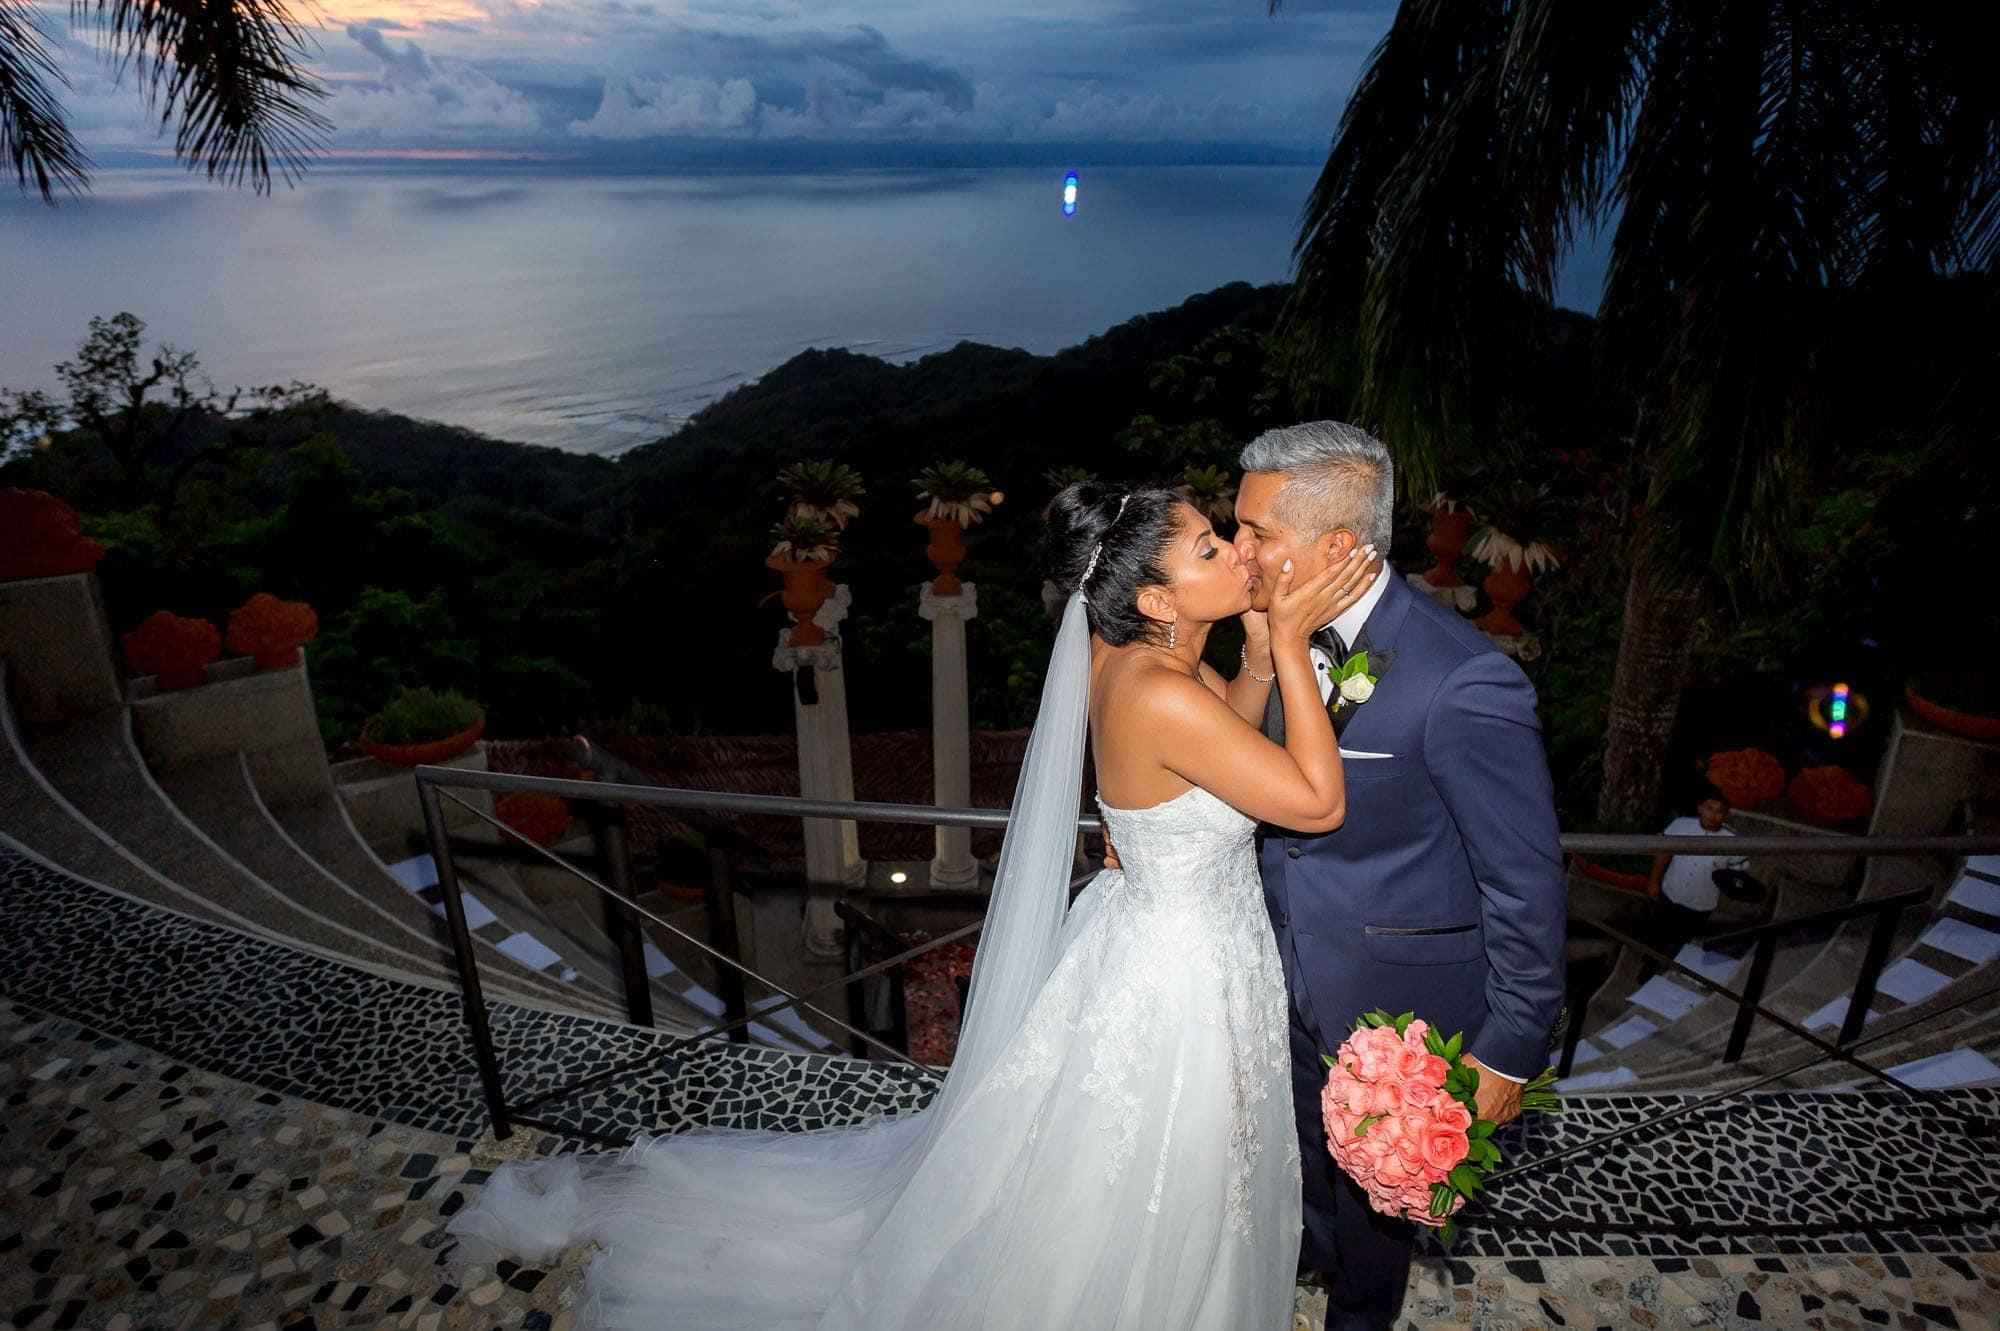 Bridal shots after the symbolic wedding ceremony